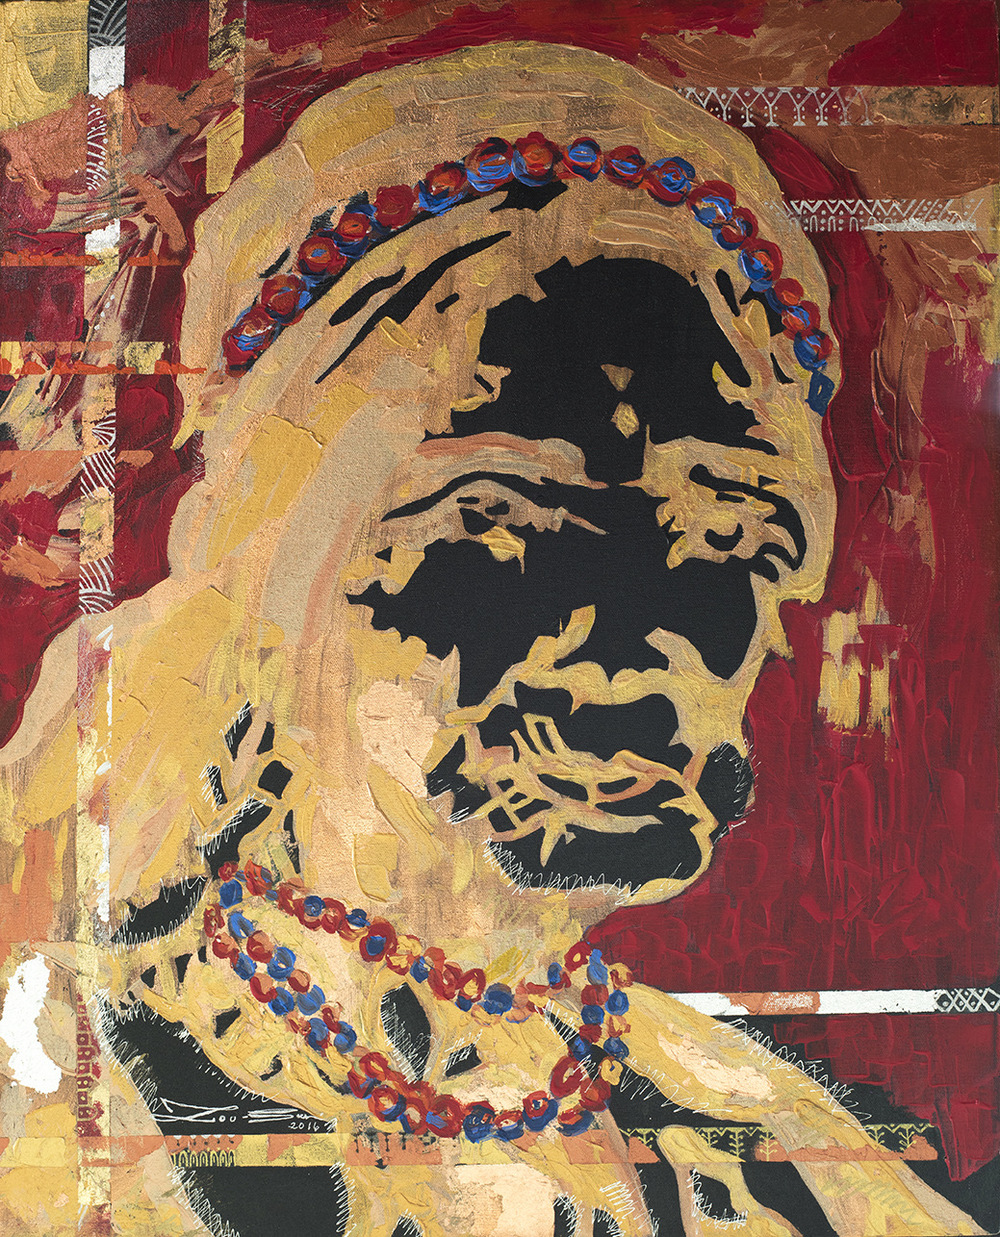 The World is my Canvas - Title : Pintados, Kalinga Tribe Series I (Whang Od) Size : 60.96X76.2 CM Medium : Acrylic on Canvas & Gold Leaf Artist : Susan V. de Guzman Year : 2016